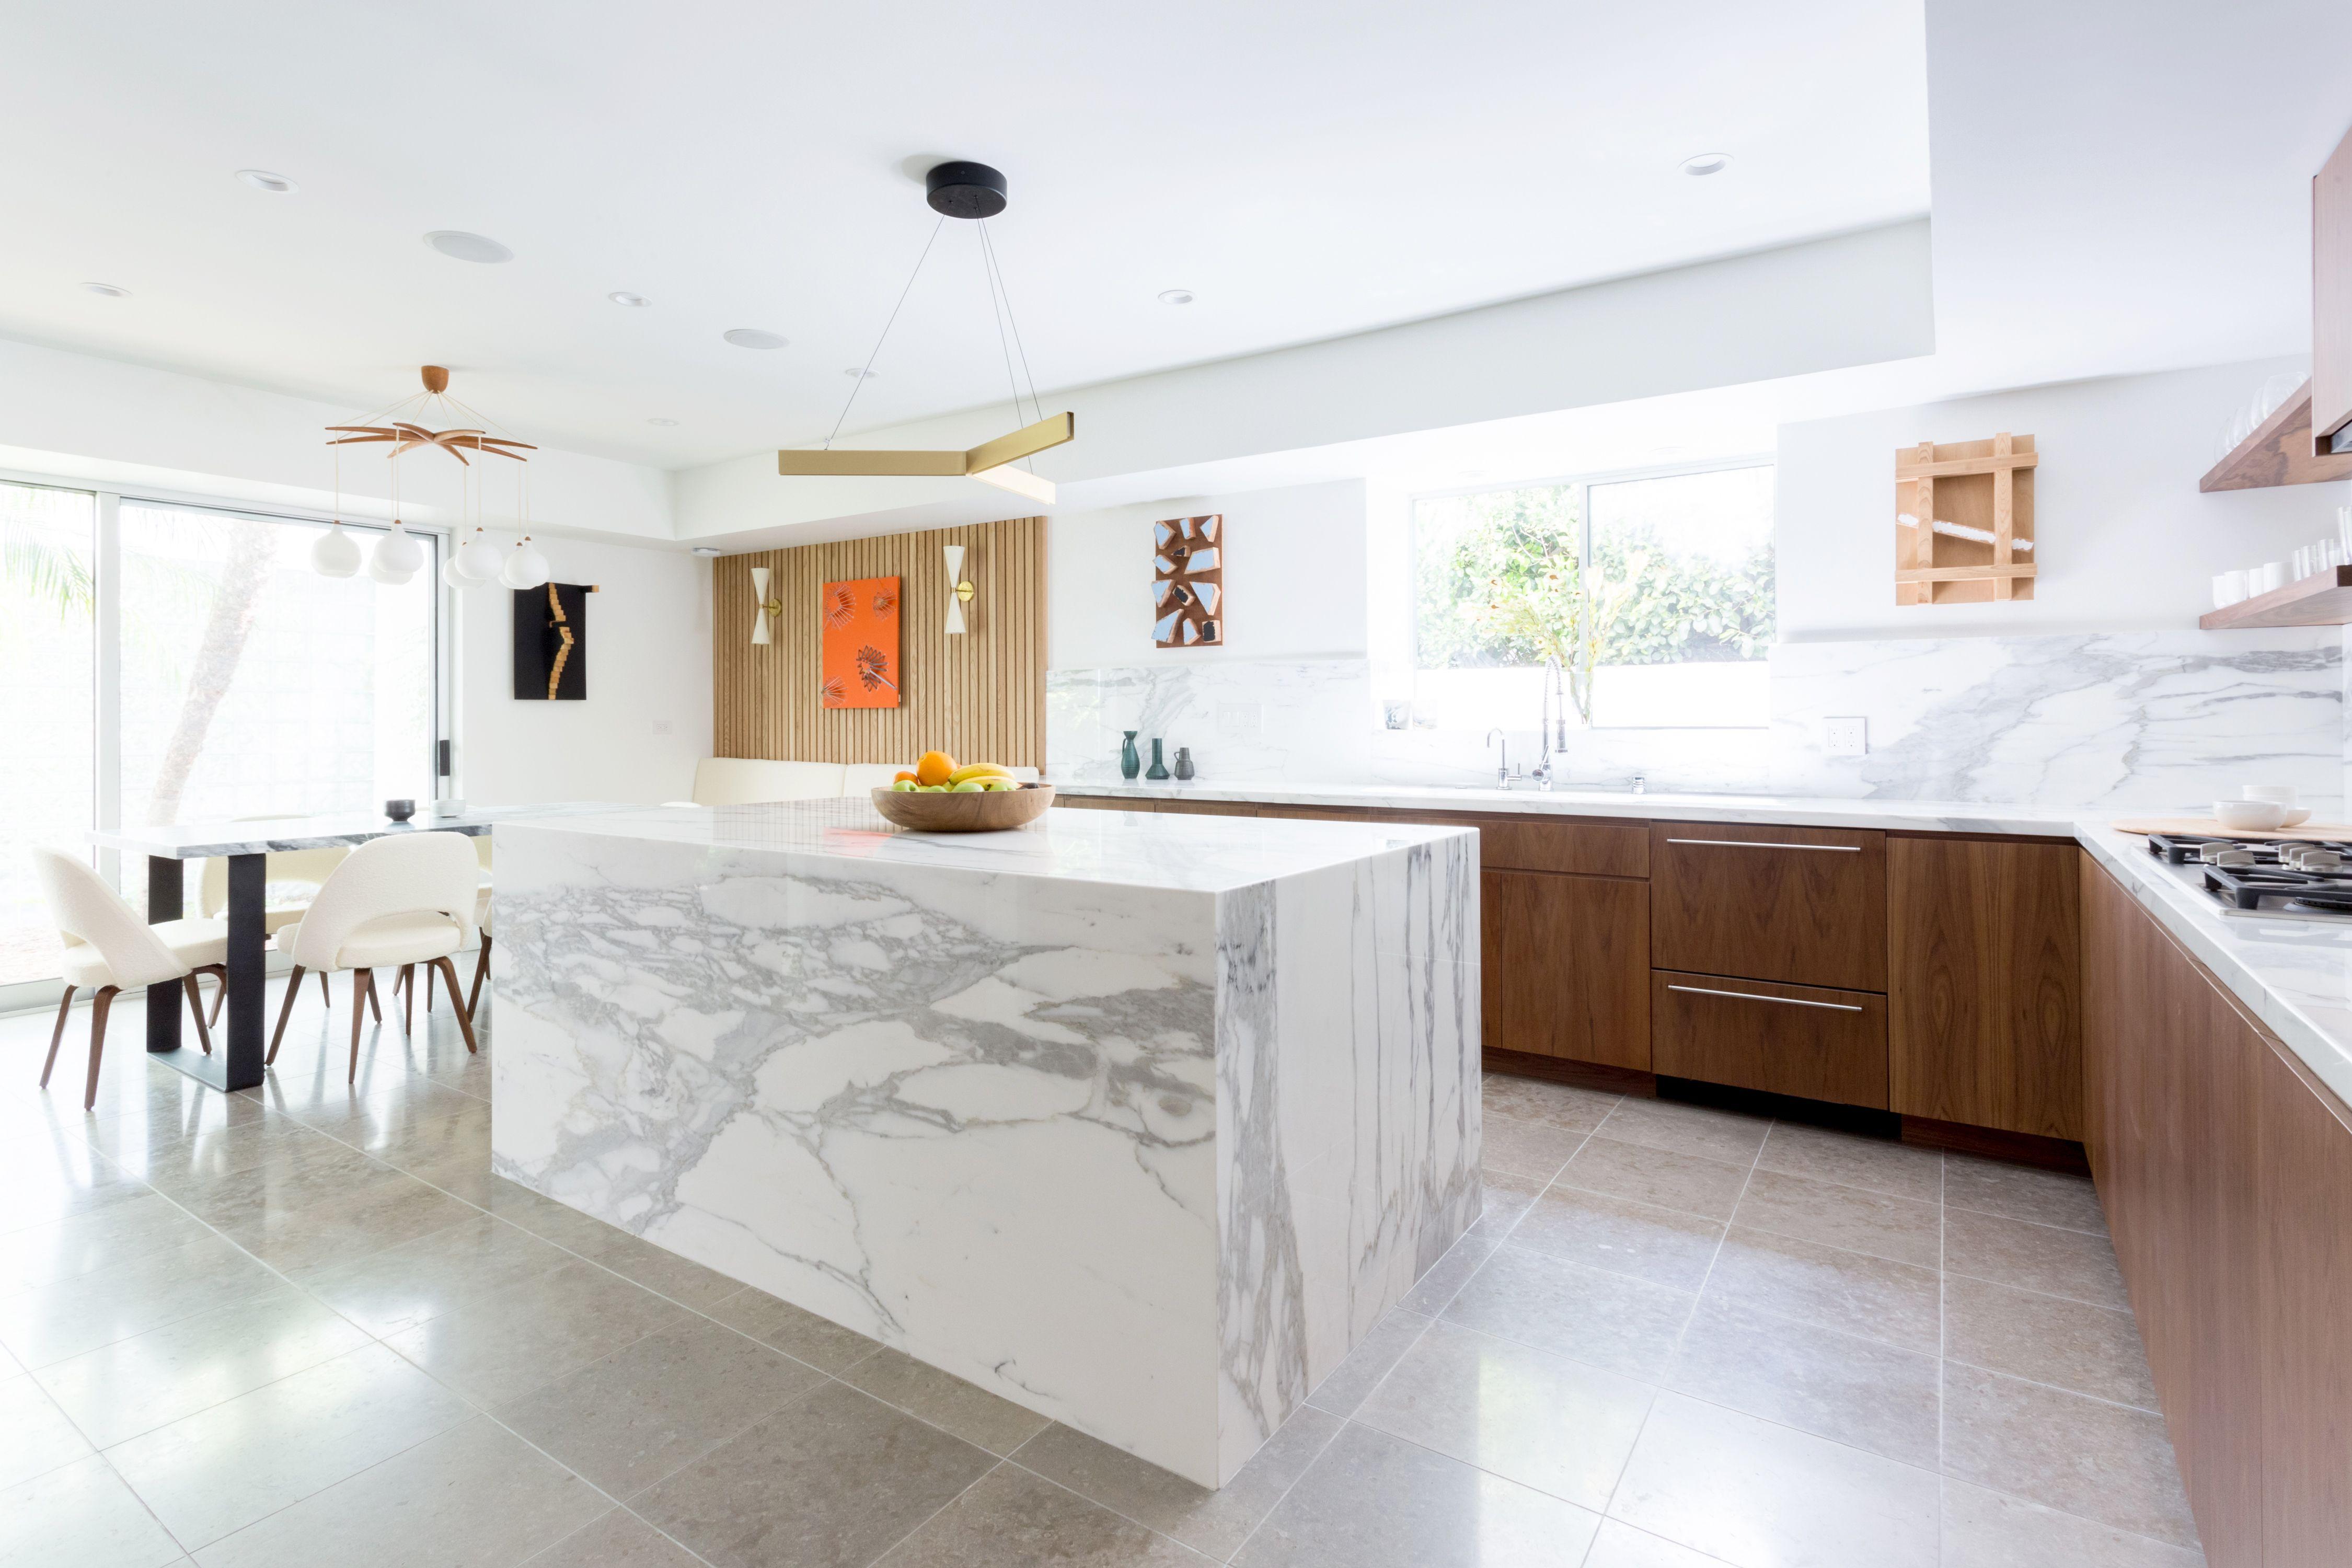 Santa Monica Kitchen Modern Marble Kitchen Contemporary Kitchen Kitchen Design M kitchen santa monica